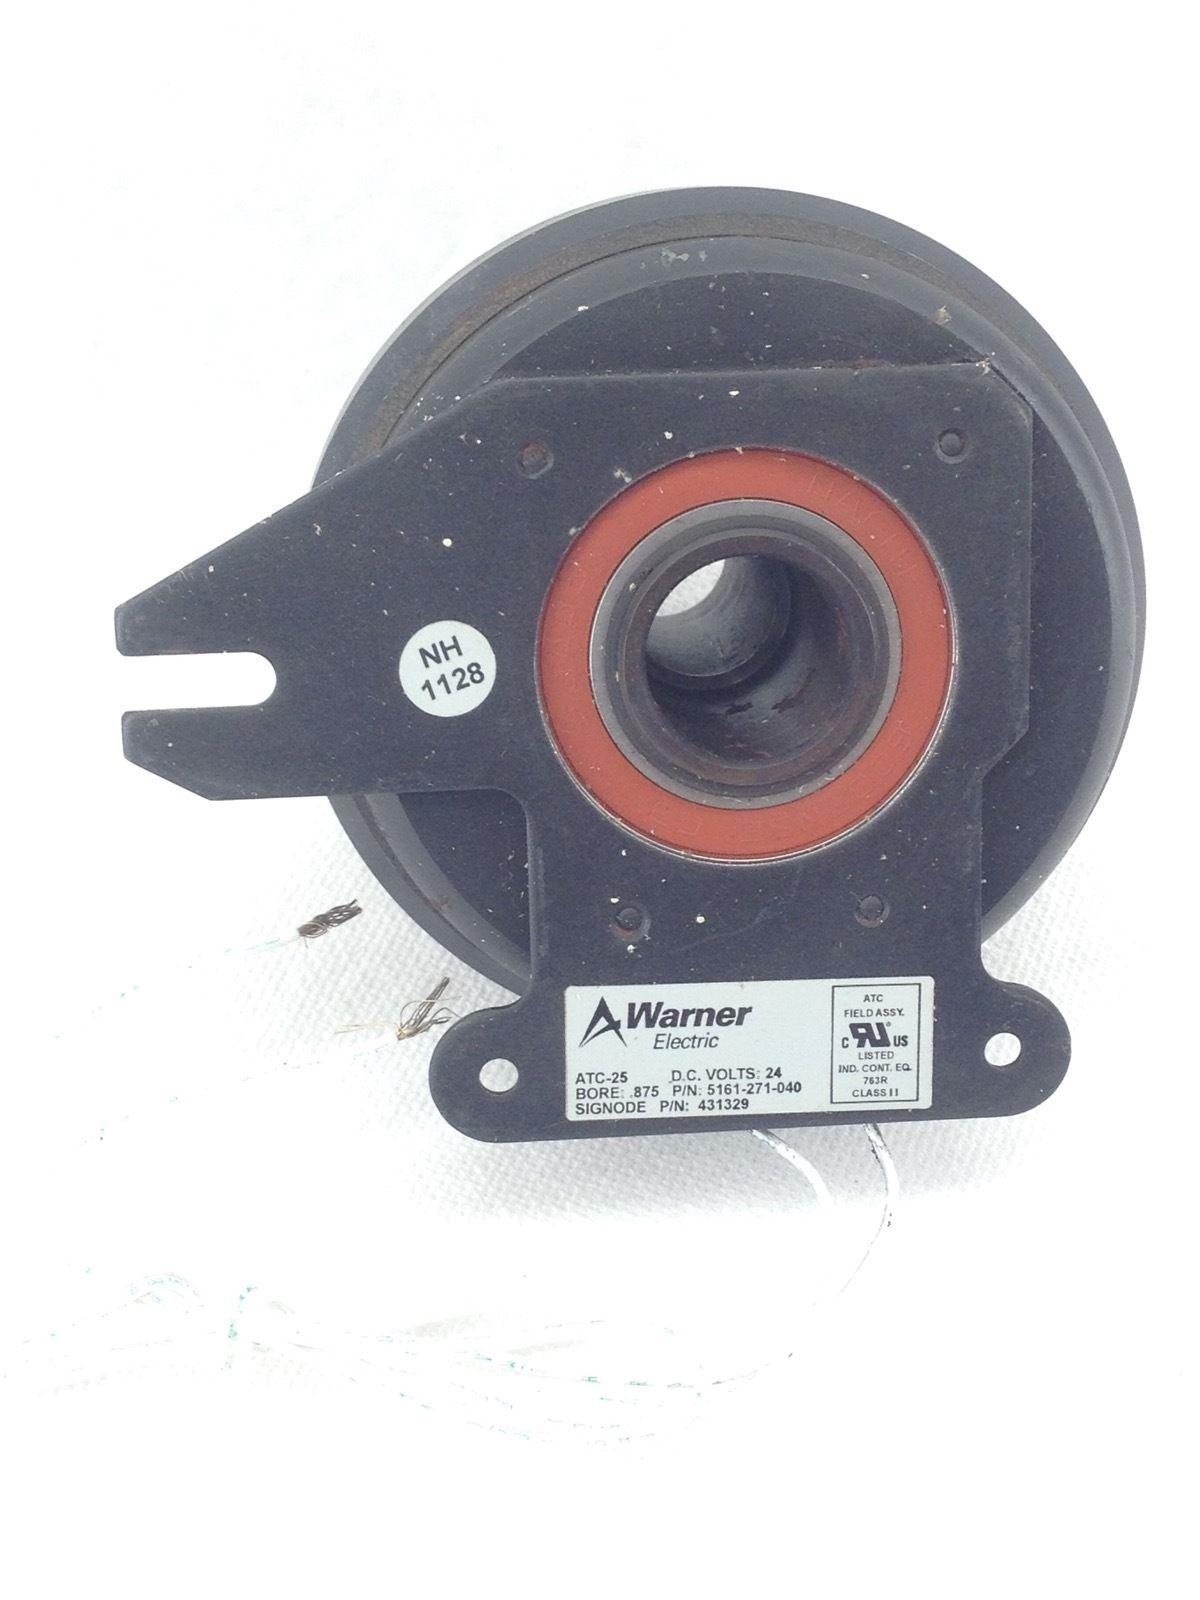 NEW! WARNER ATC-25 ELECTRIC CLUTCH 5161-271-040 24VDC SIGNODE 431329 (B191) 1